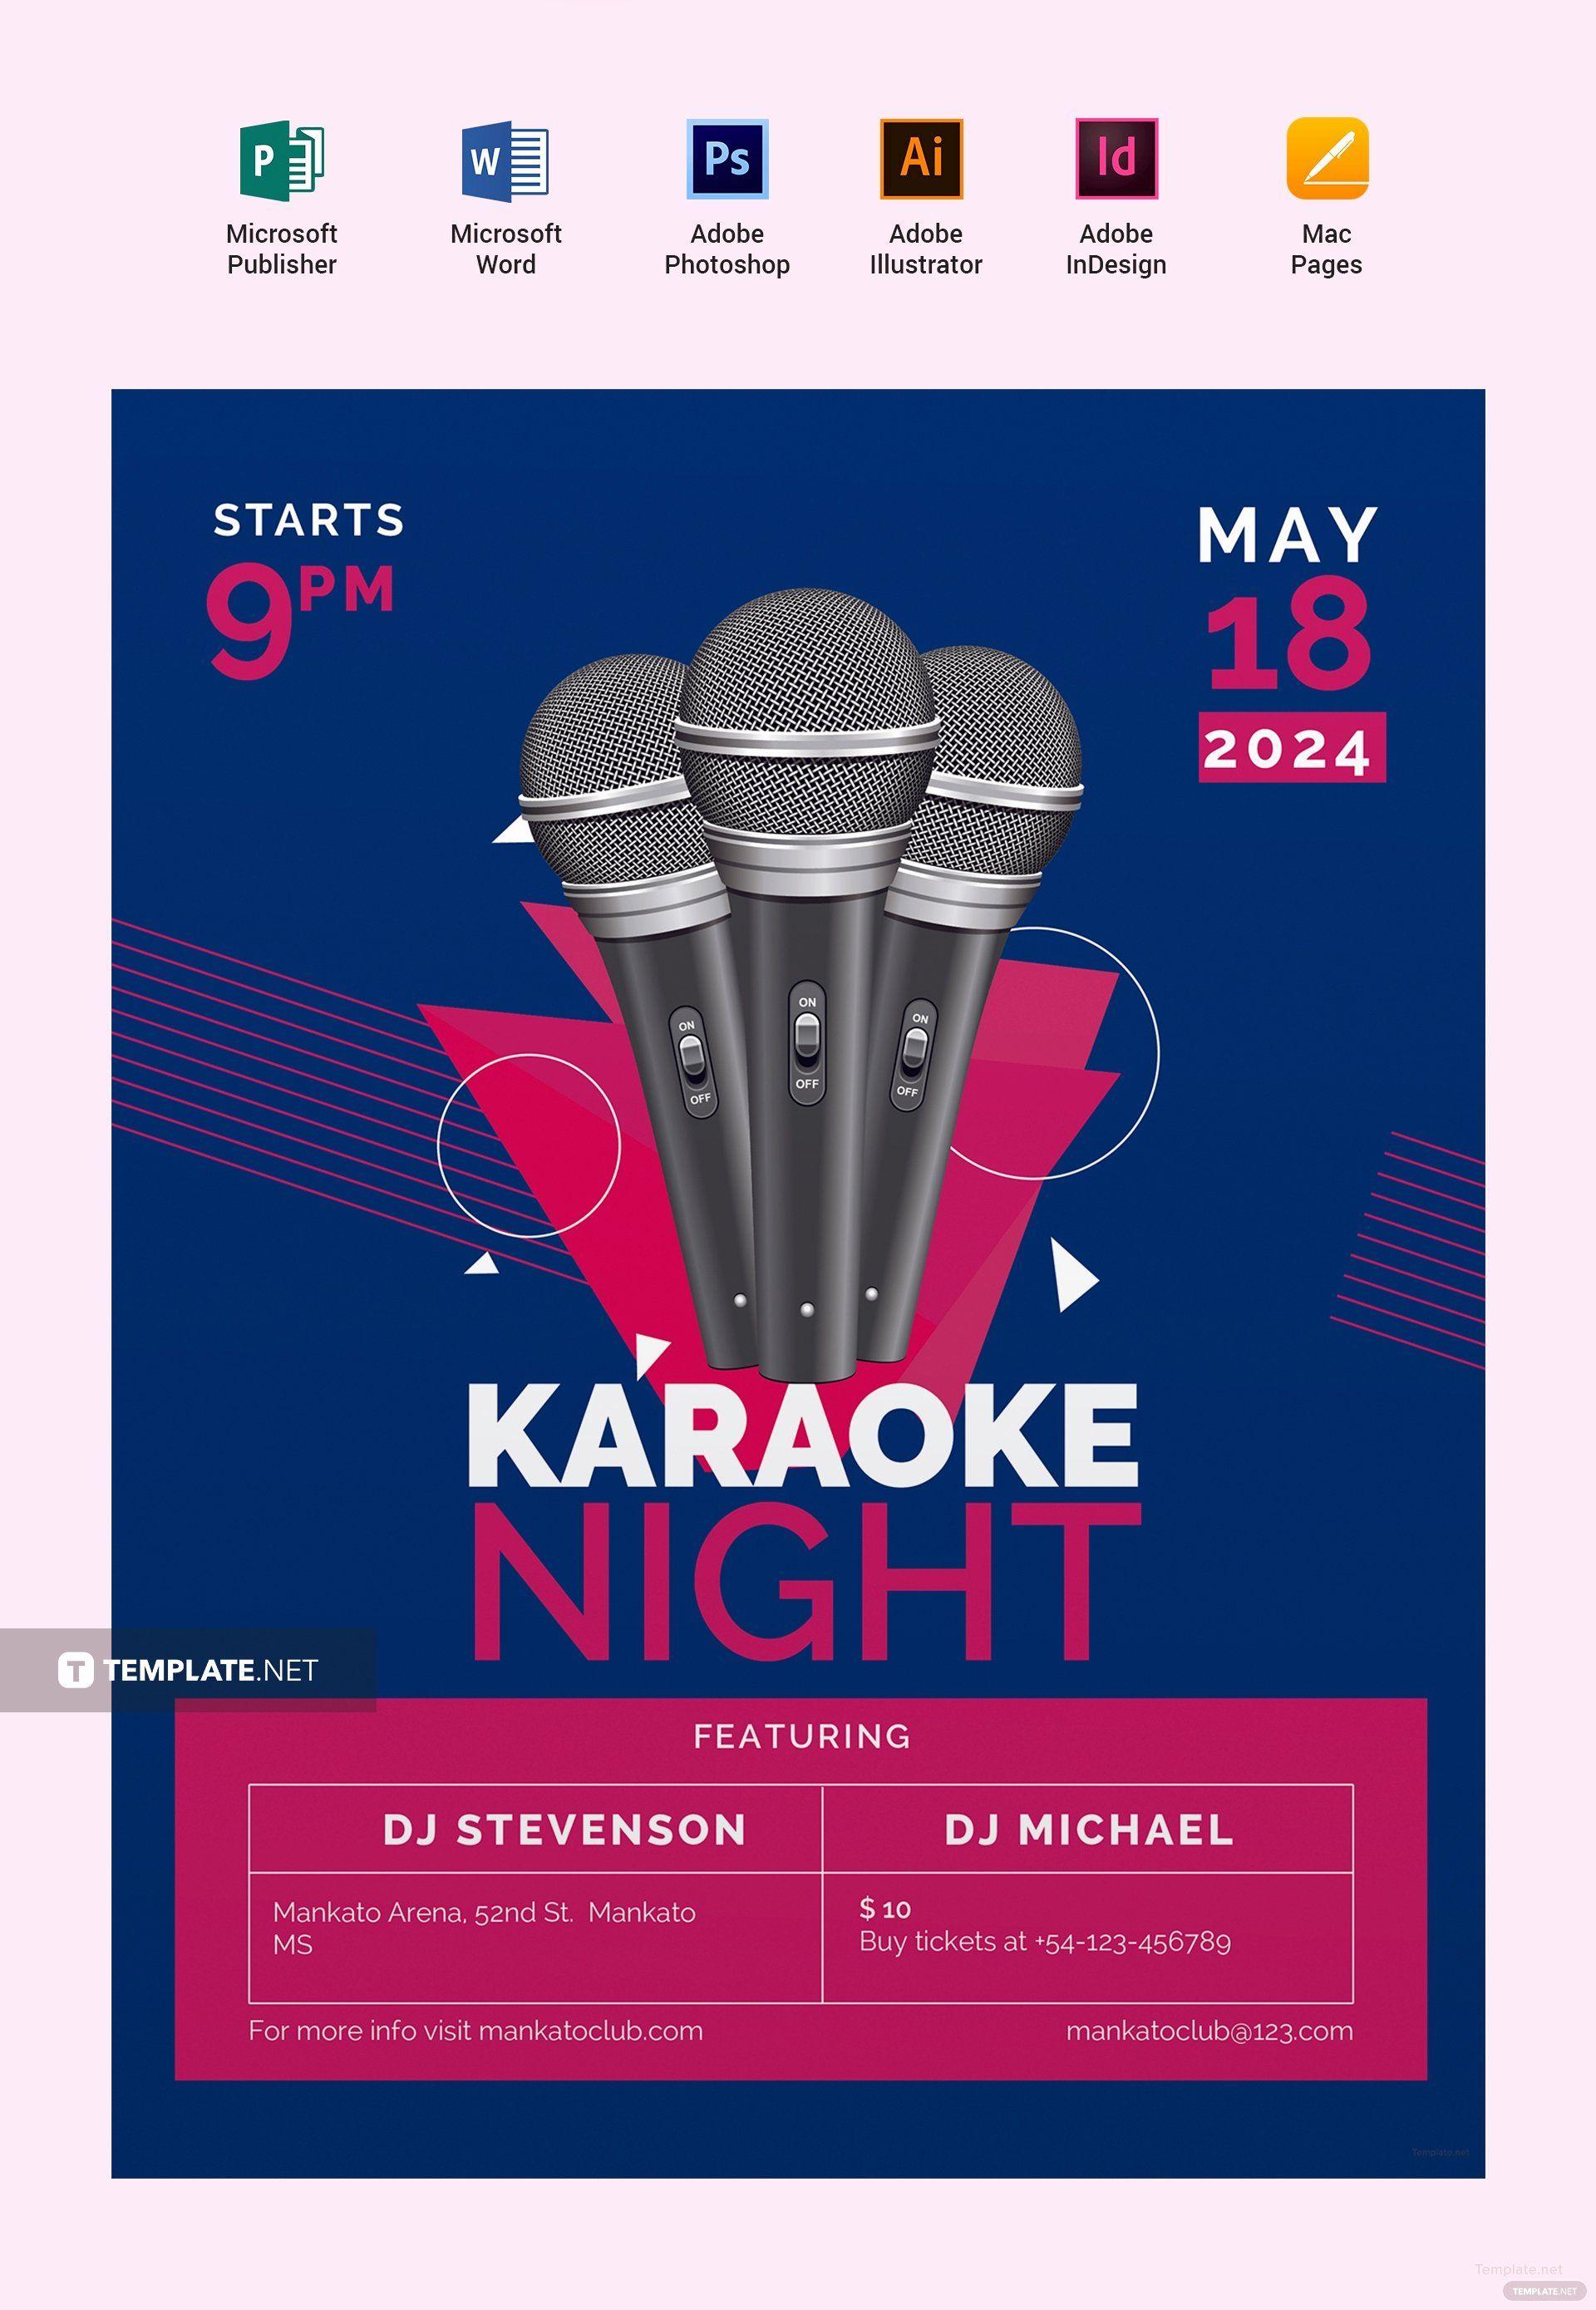 Templates For Flyers Free Fresh Free Karaoke Flyer